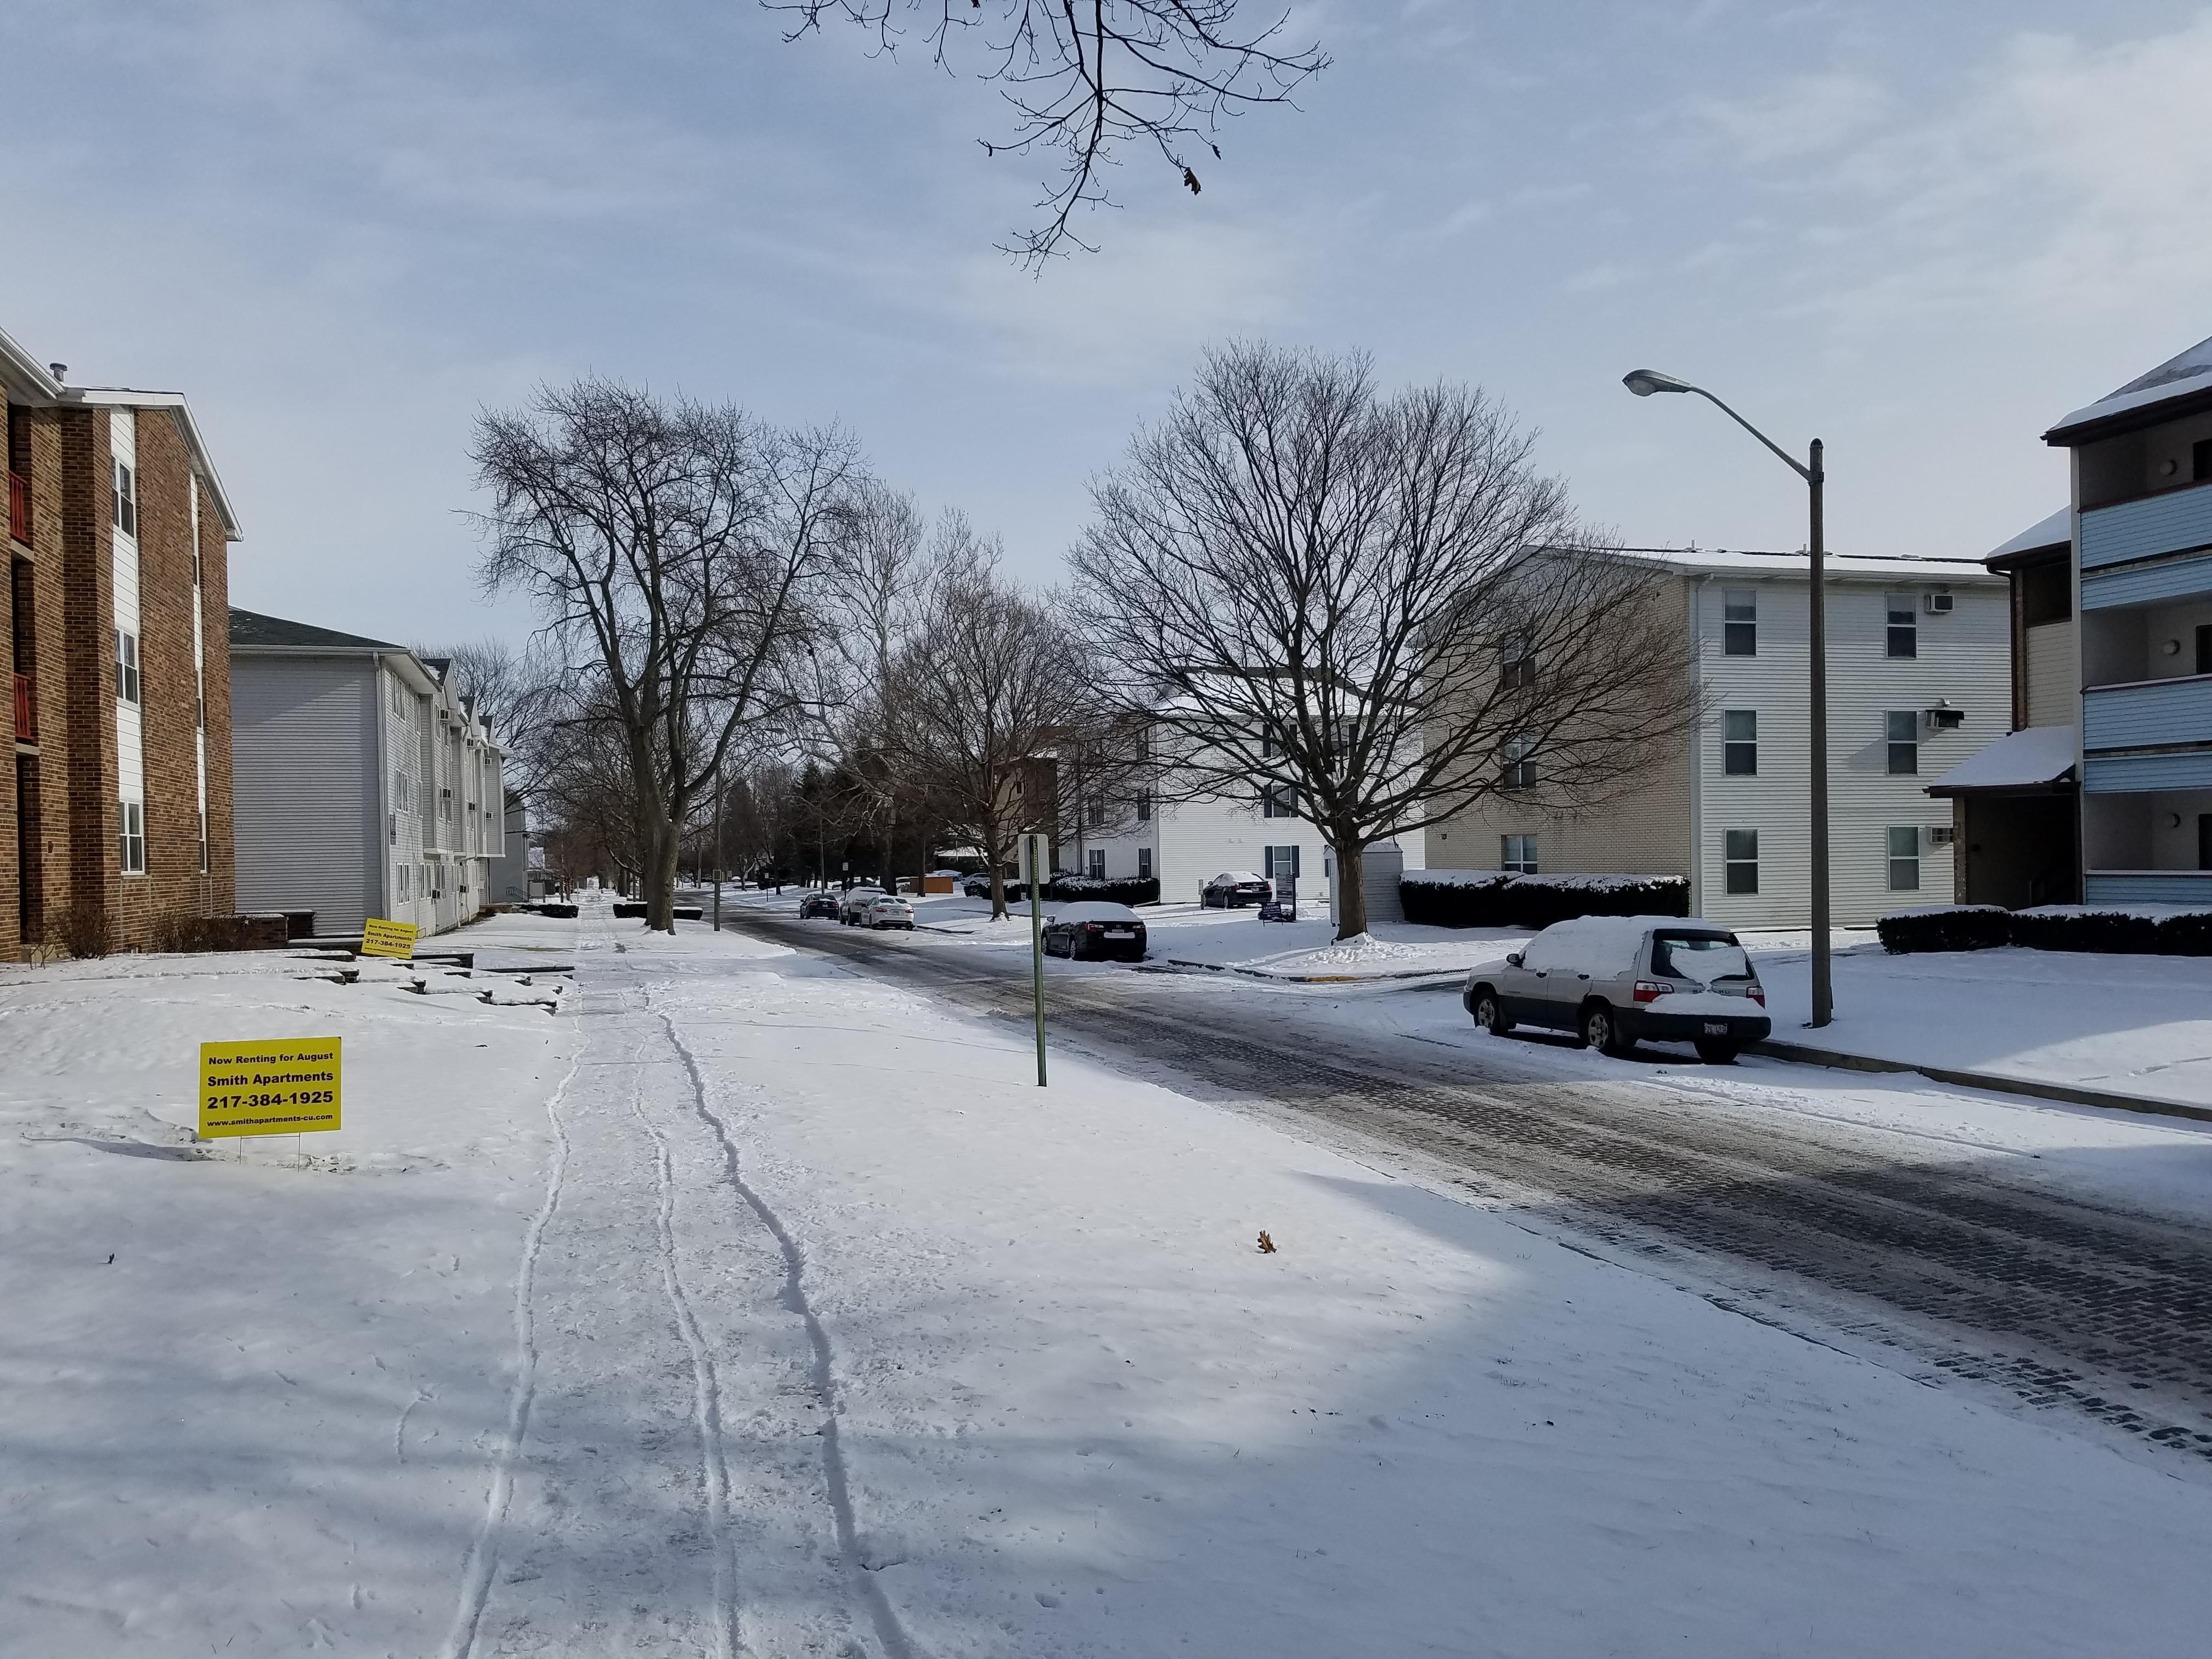 A snowy day on Clark Street in Urbana.